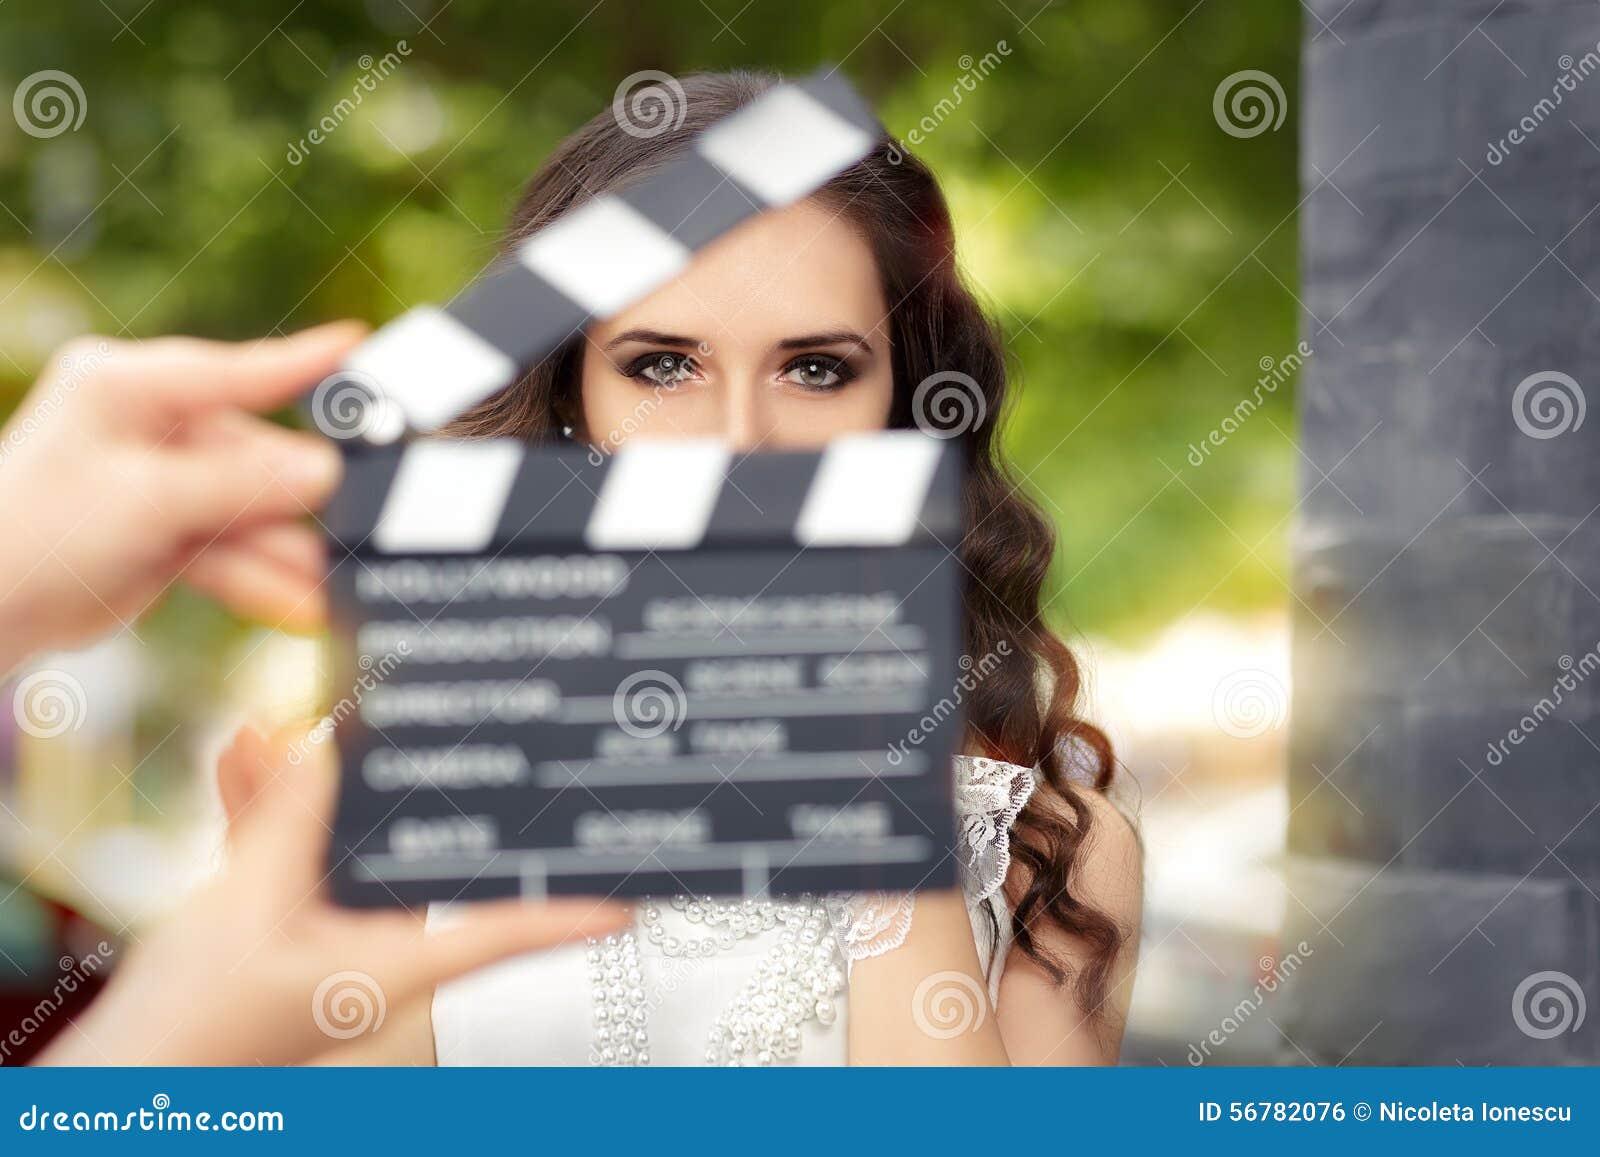 ready film free download